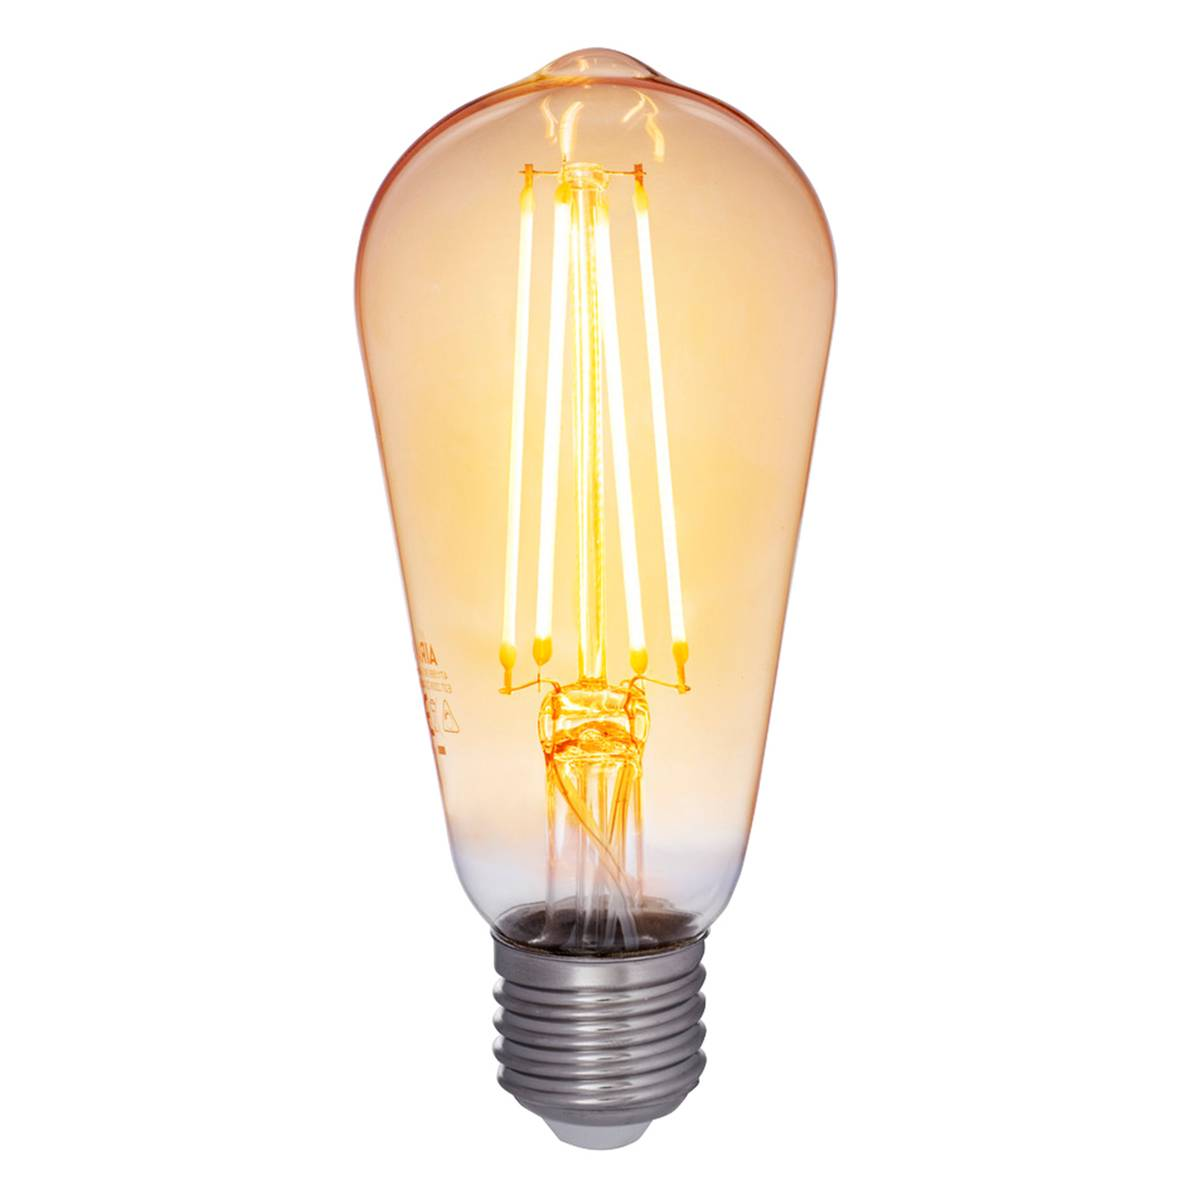 Airam Decor Amber LED Edison lamppu 5W E27 380lm, himmennett�v�